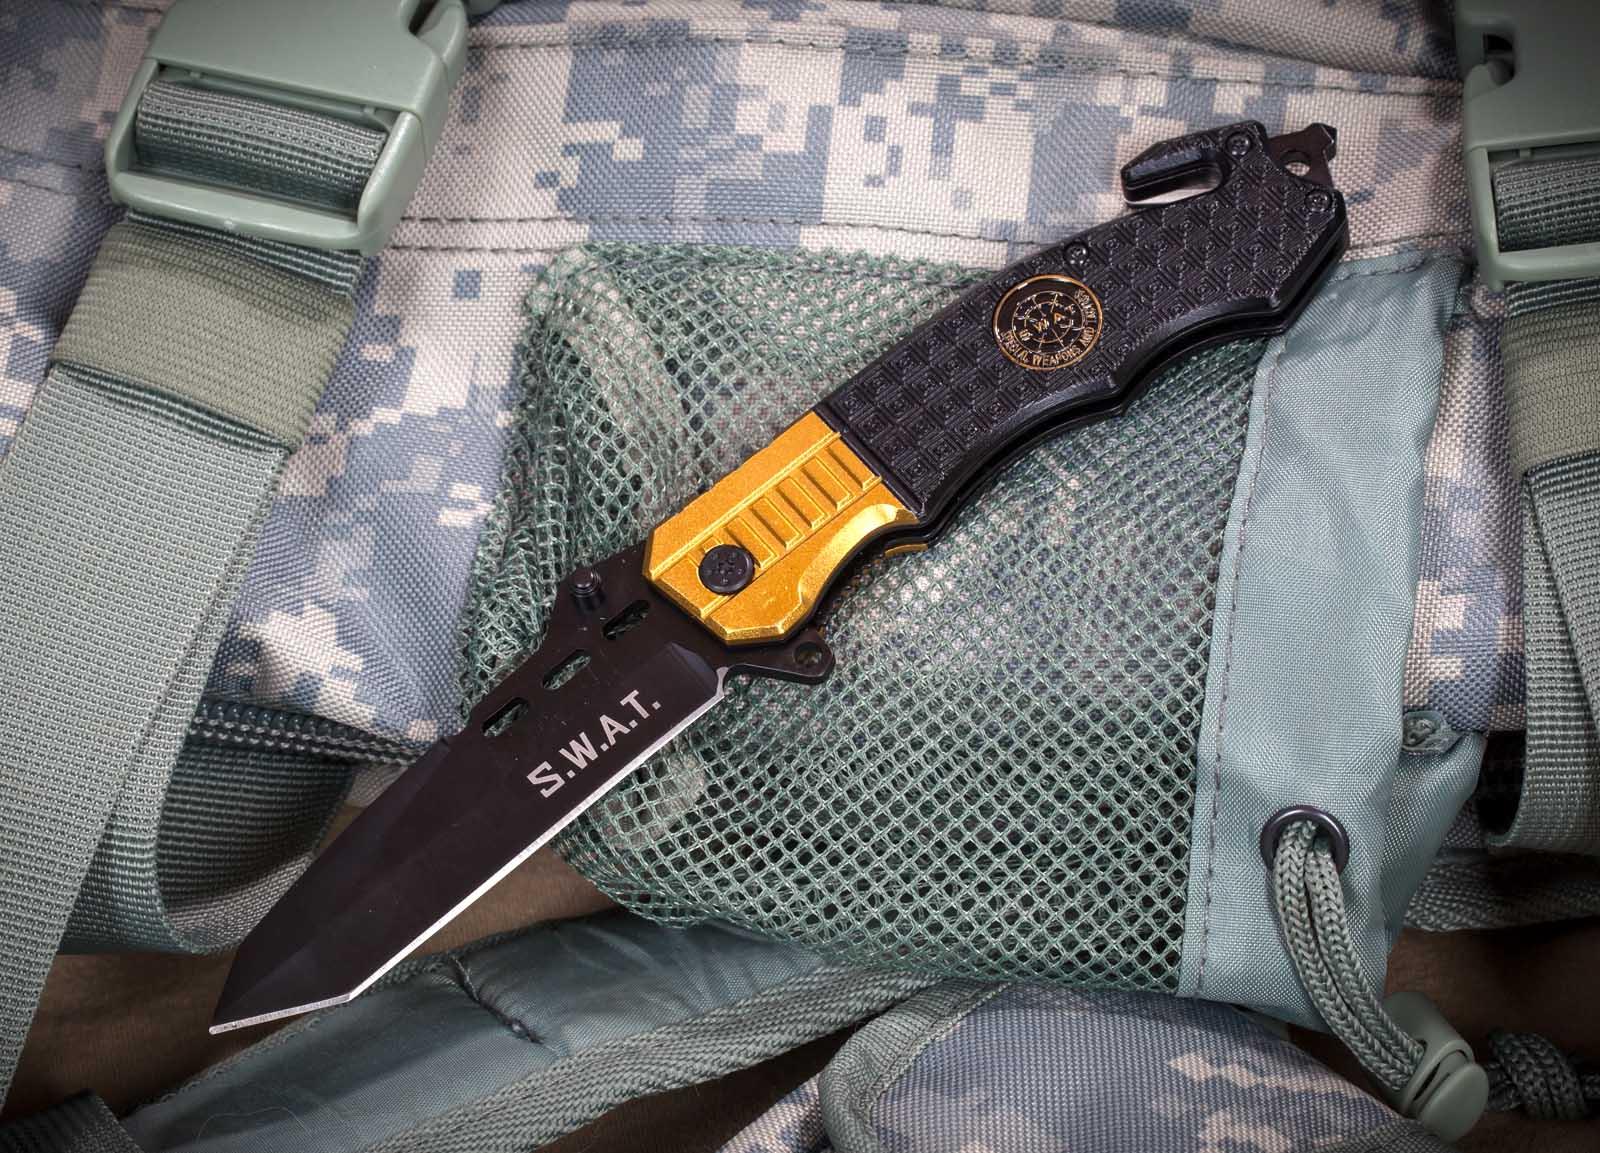 Тактический нож Martinez Albainox SWAT (Испания)